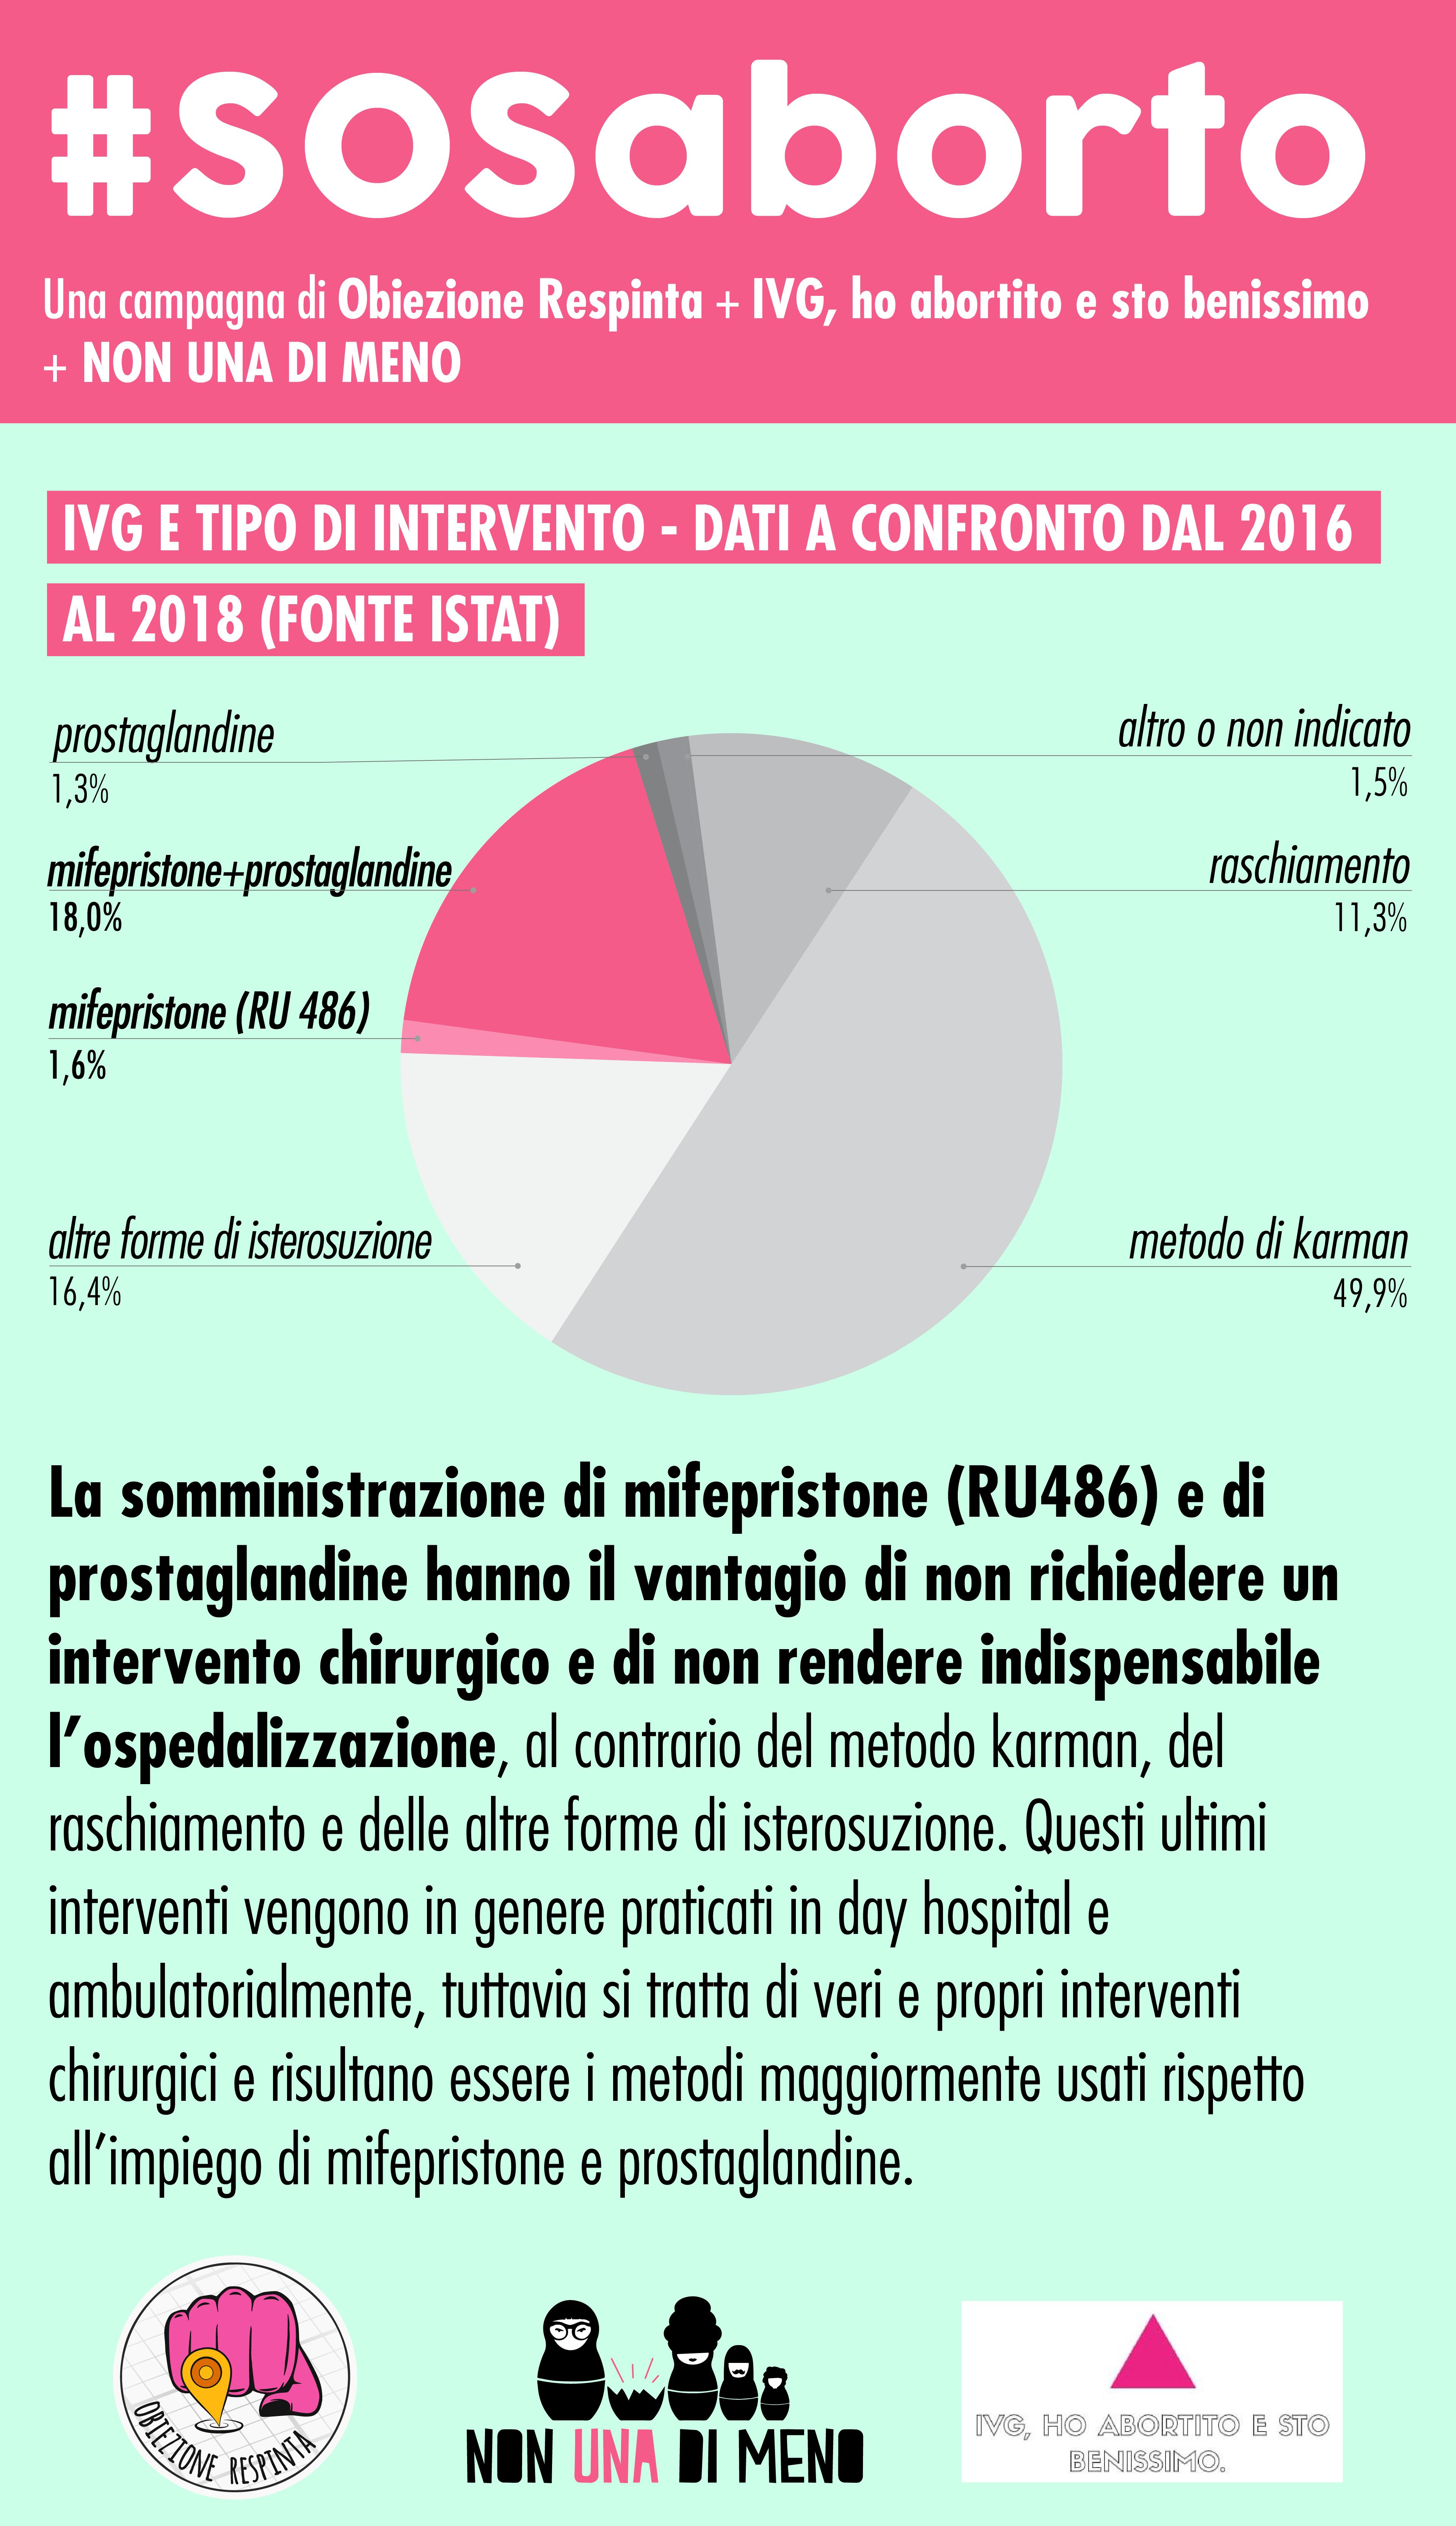 nudm_sos_aborto_infografica_2_mobile_tab_3@2x